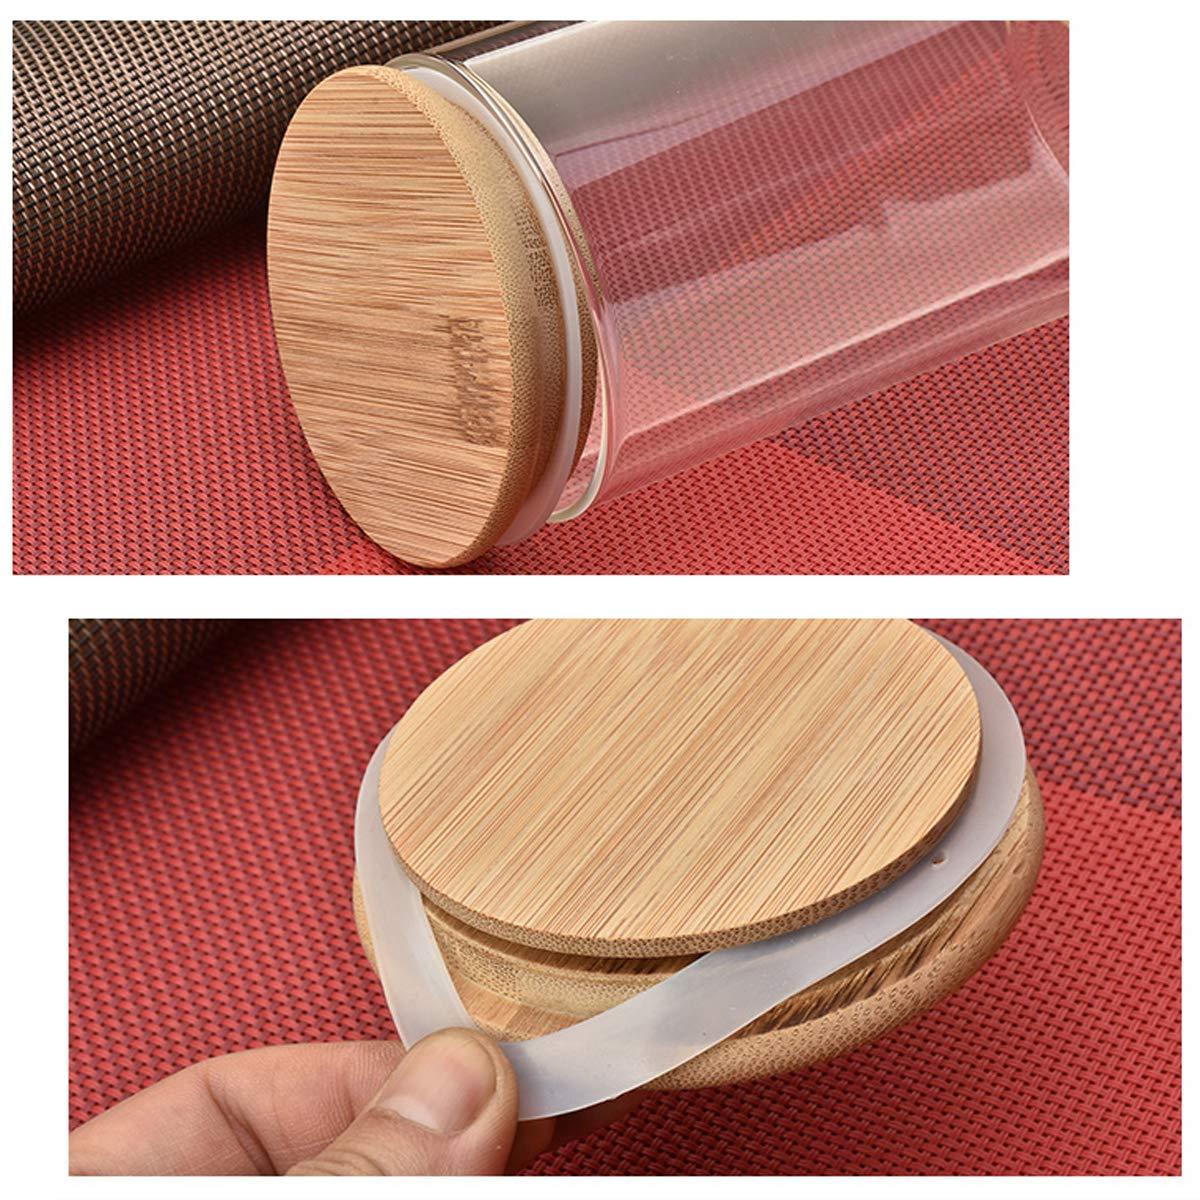 Pote De Vidro Tampa De Bambu Para Mantimentos 480ML